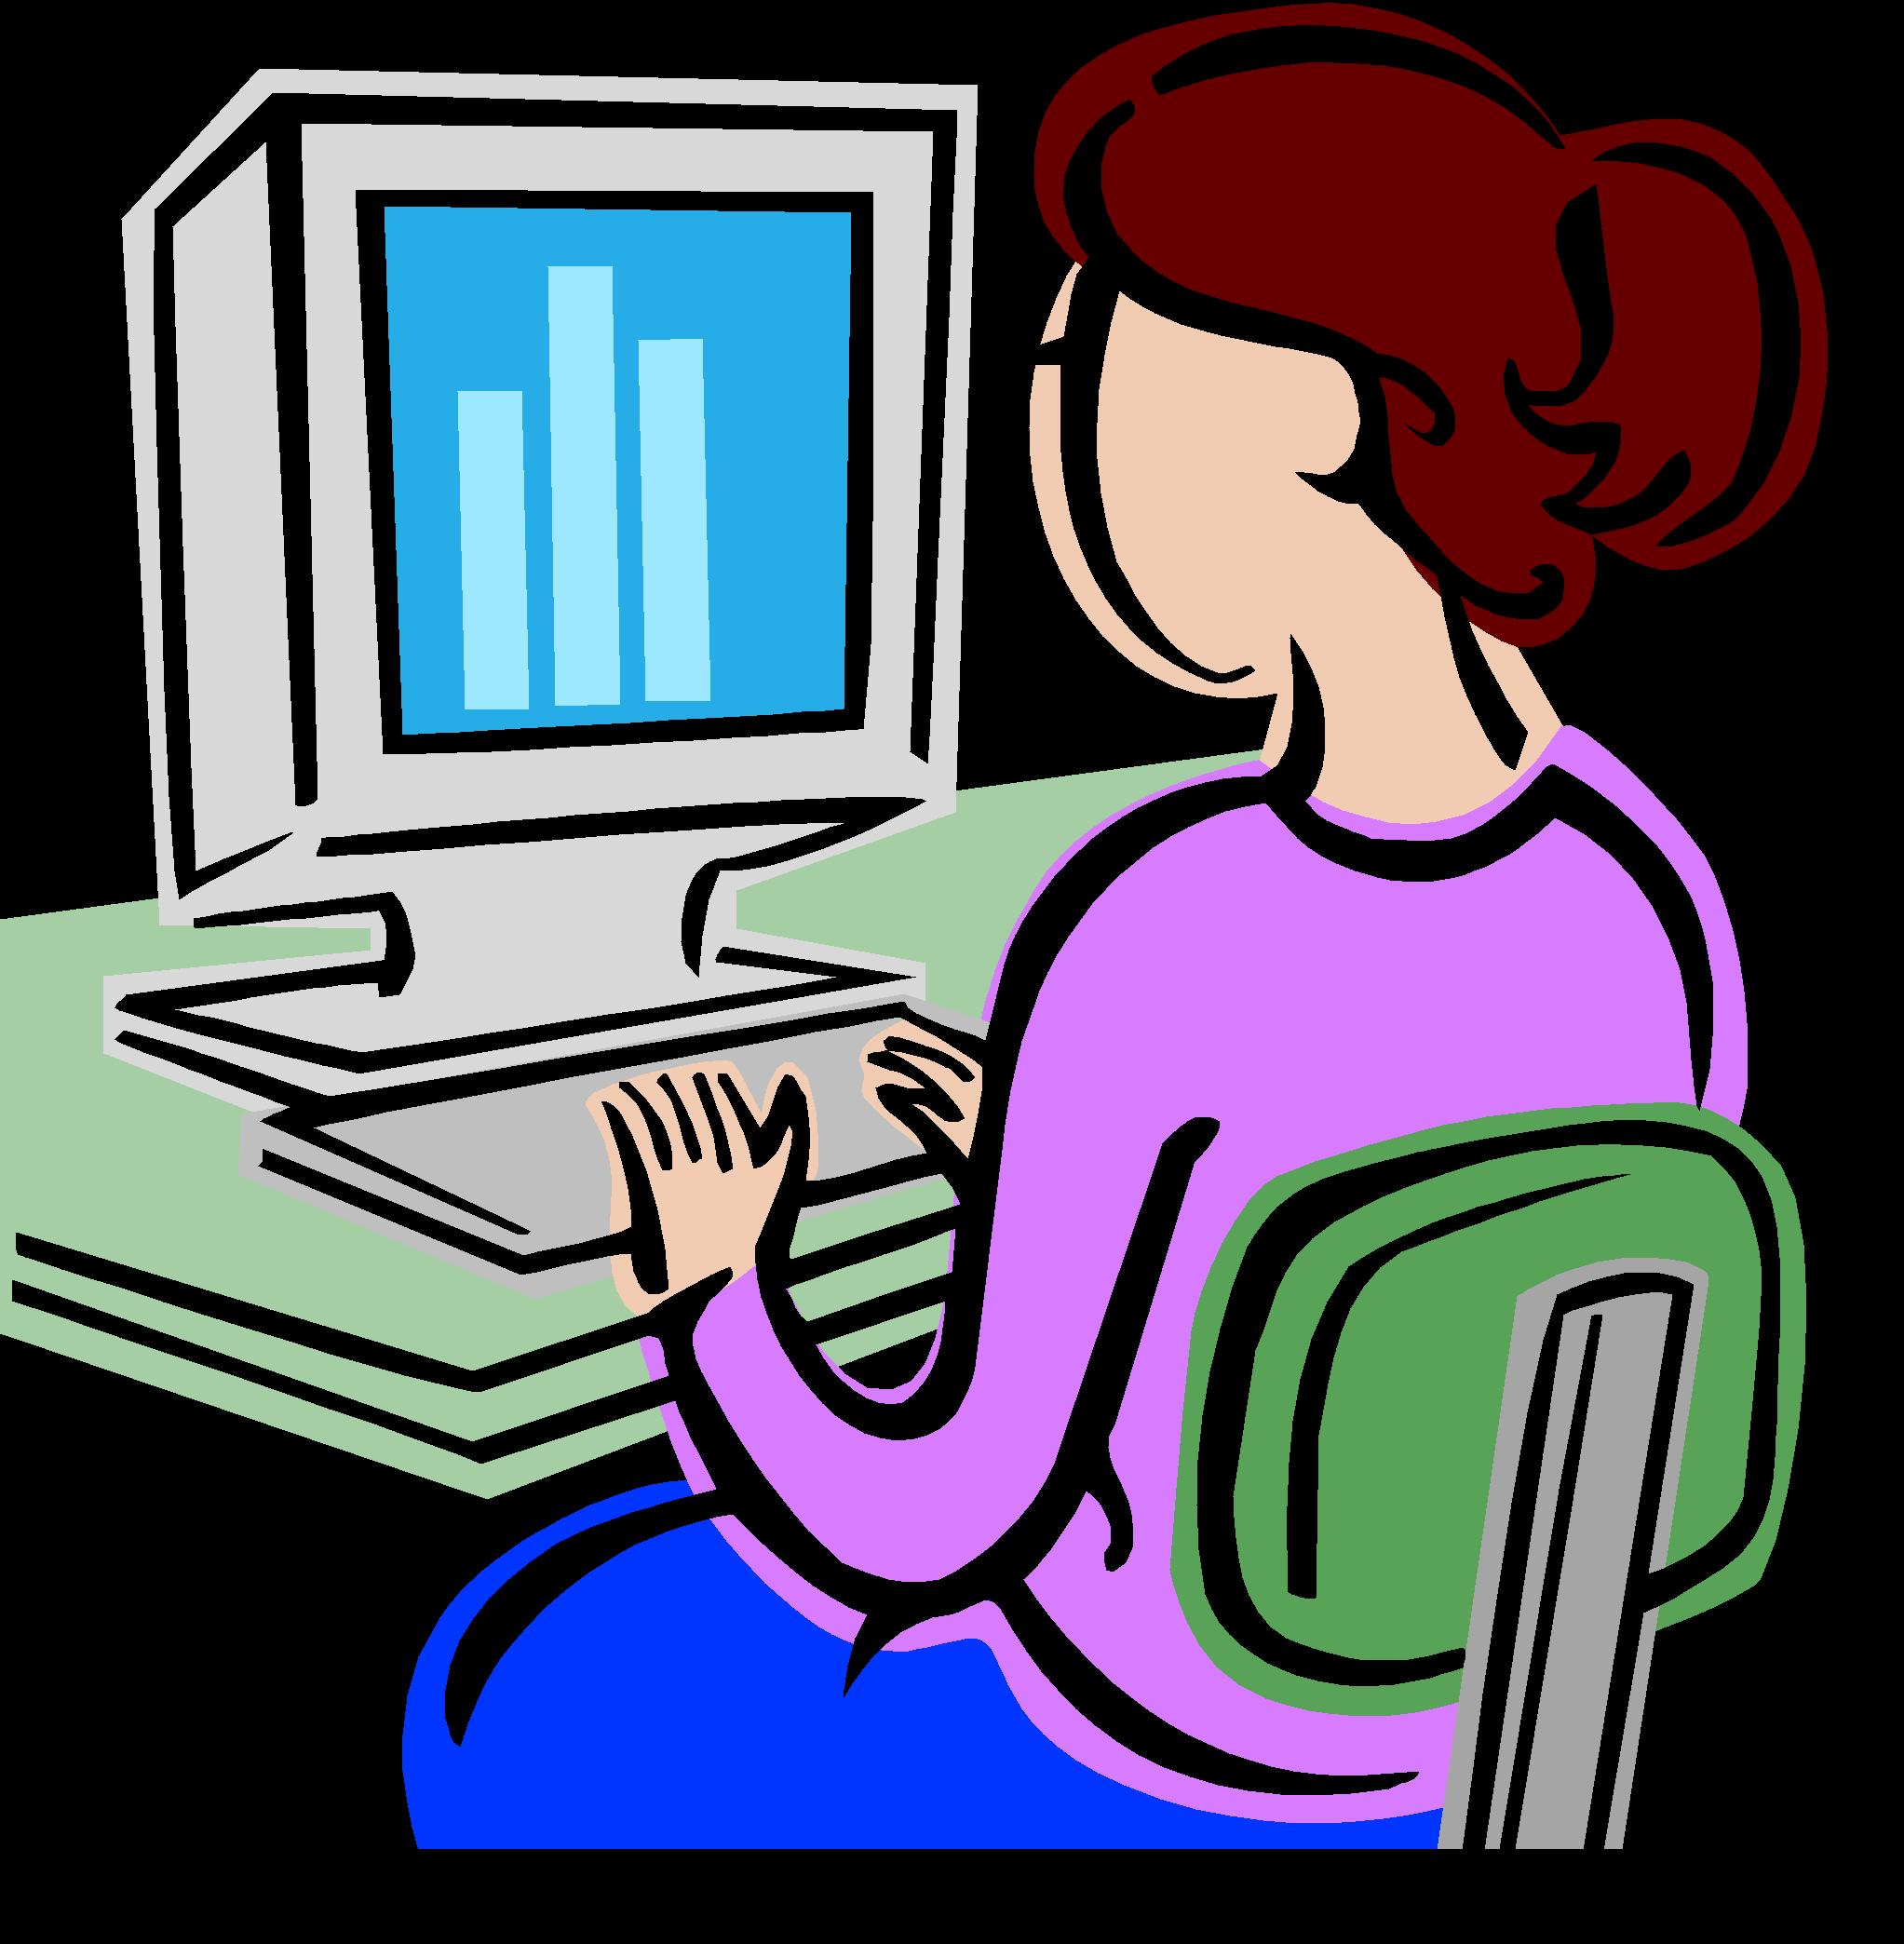 Teks based ieps resource. Curriculum clipart iep